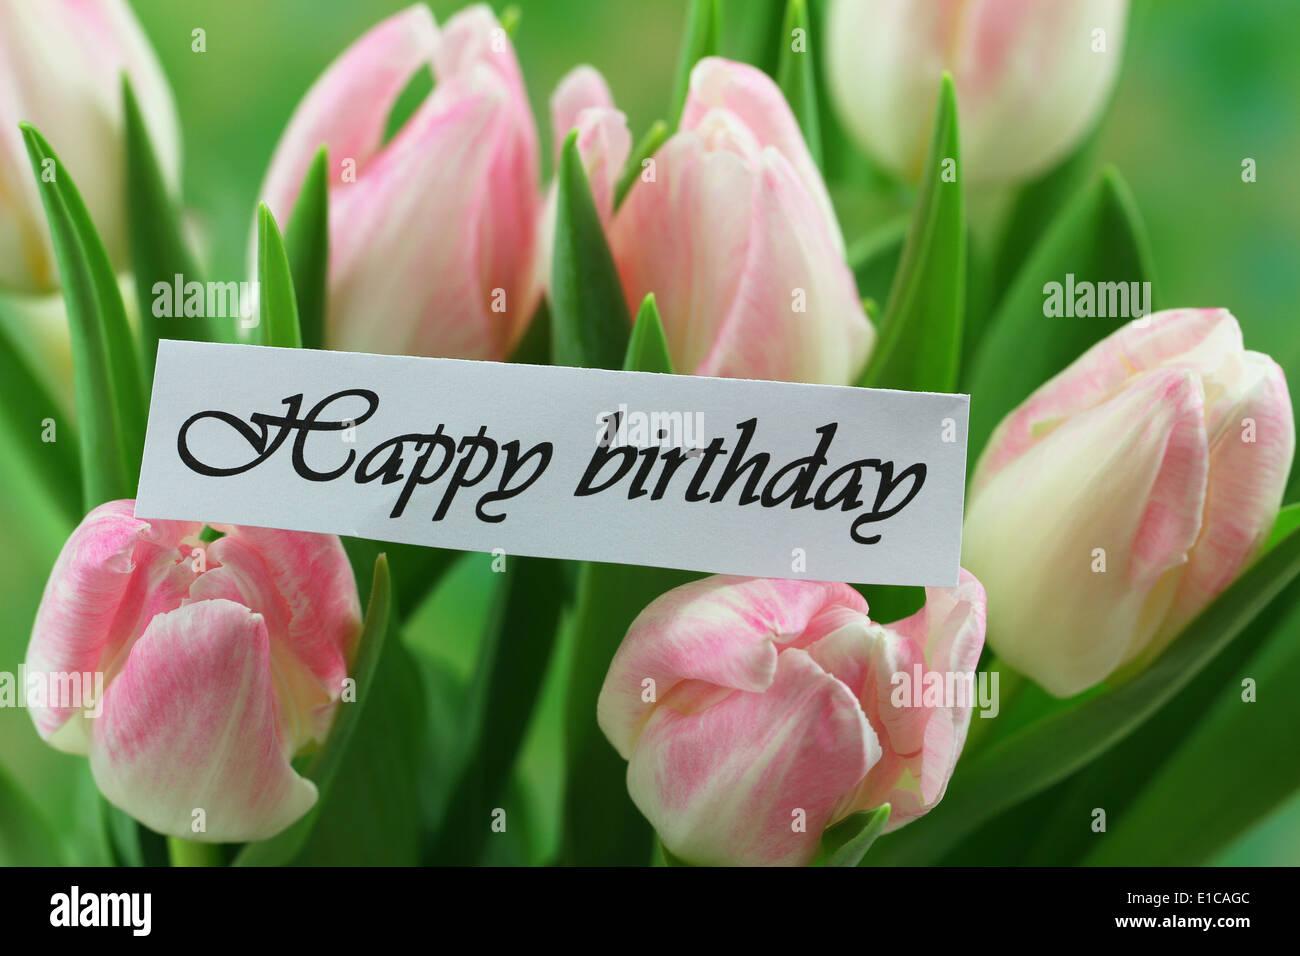 Happy Birthday Card With Pink Tulips Stock Photo Alamy